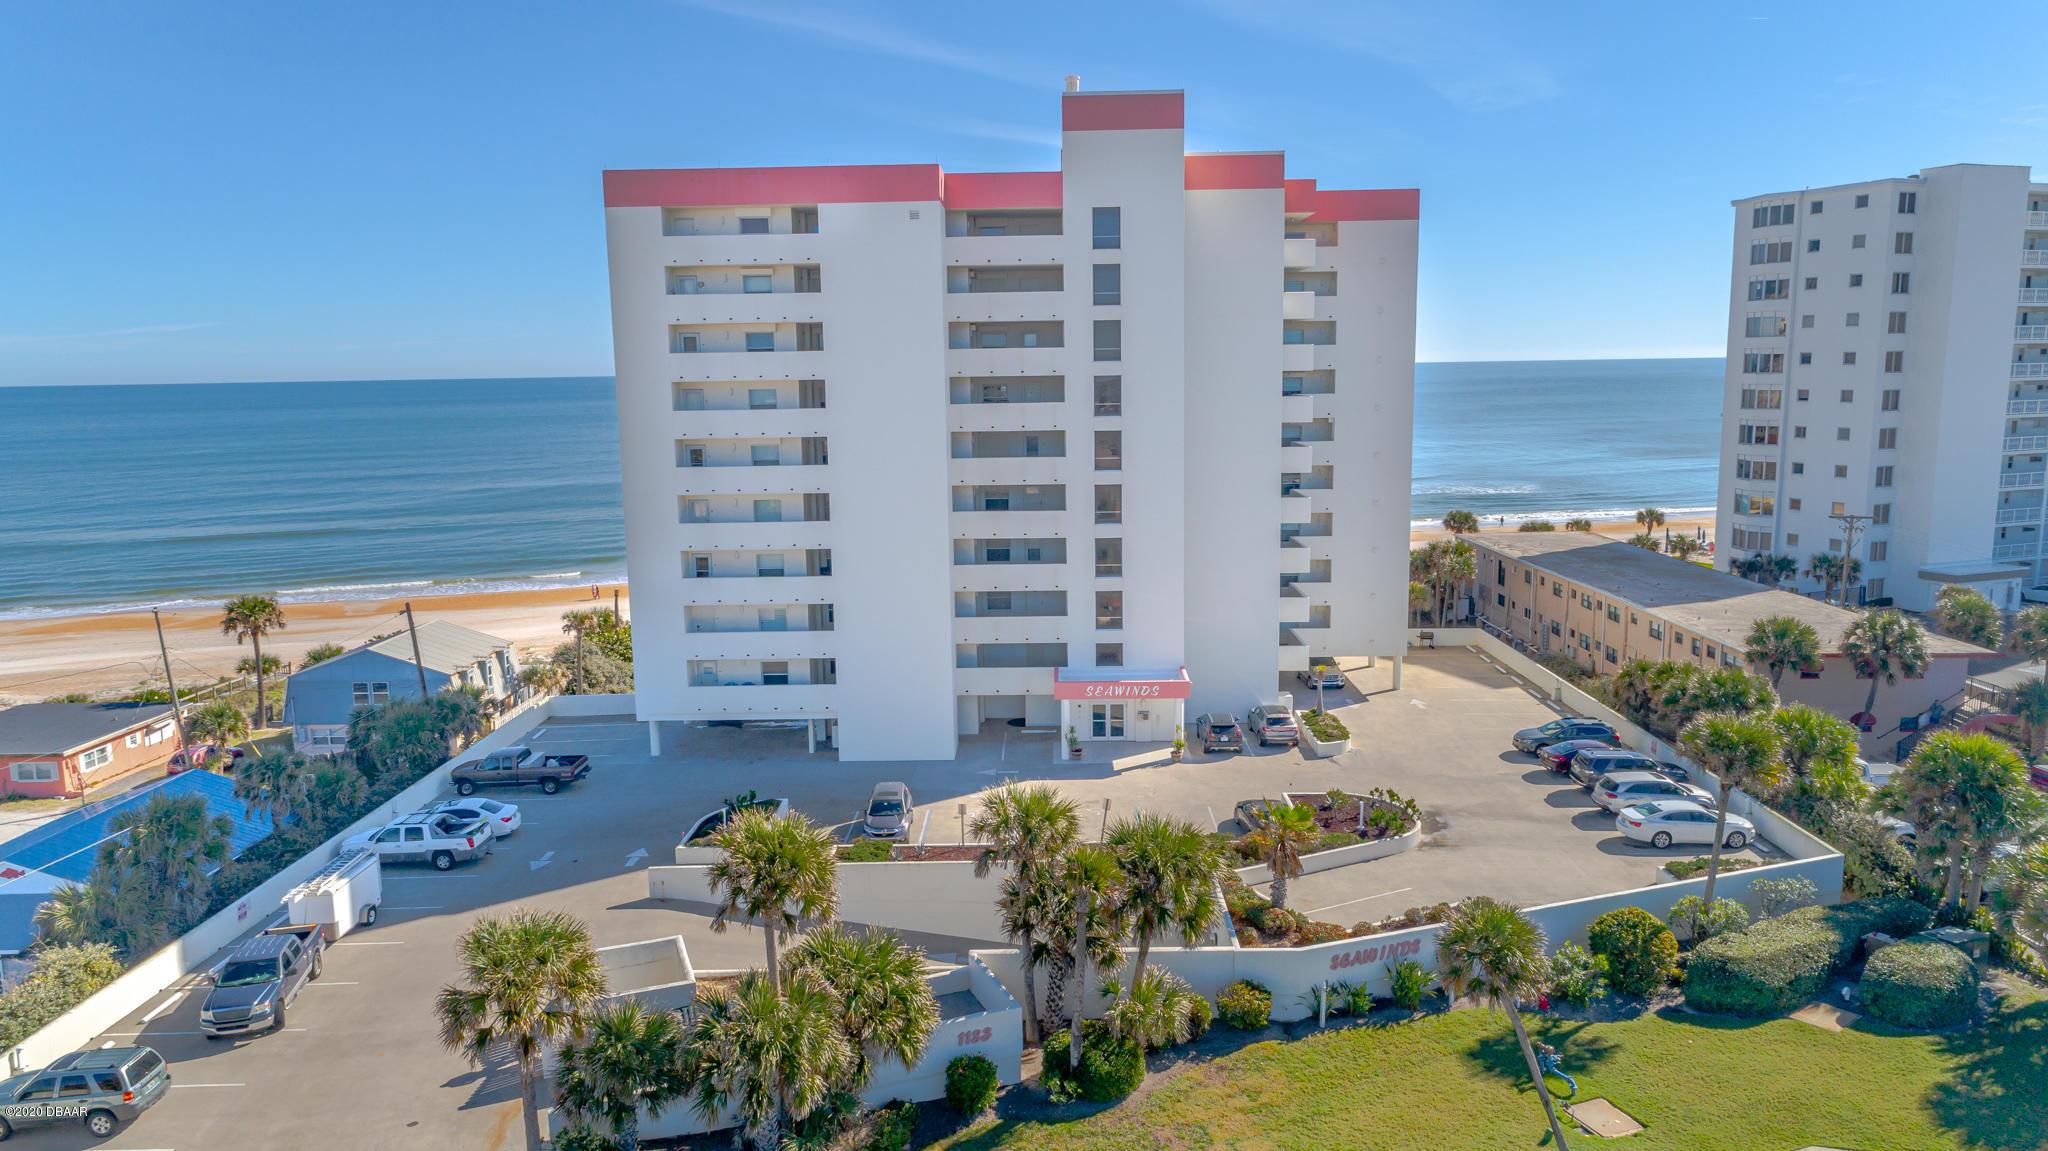 Details for 1183 Ocean Shore Boulevard 802, Ormond Beach, FL 32176